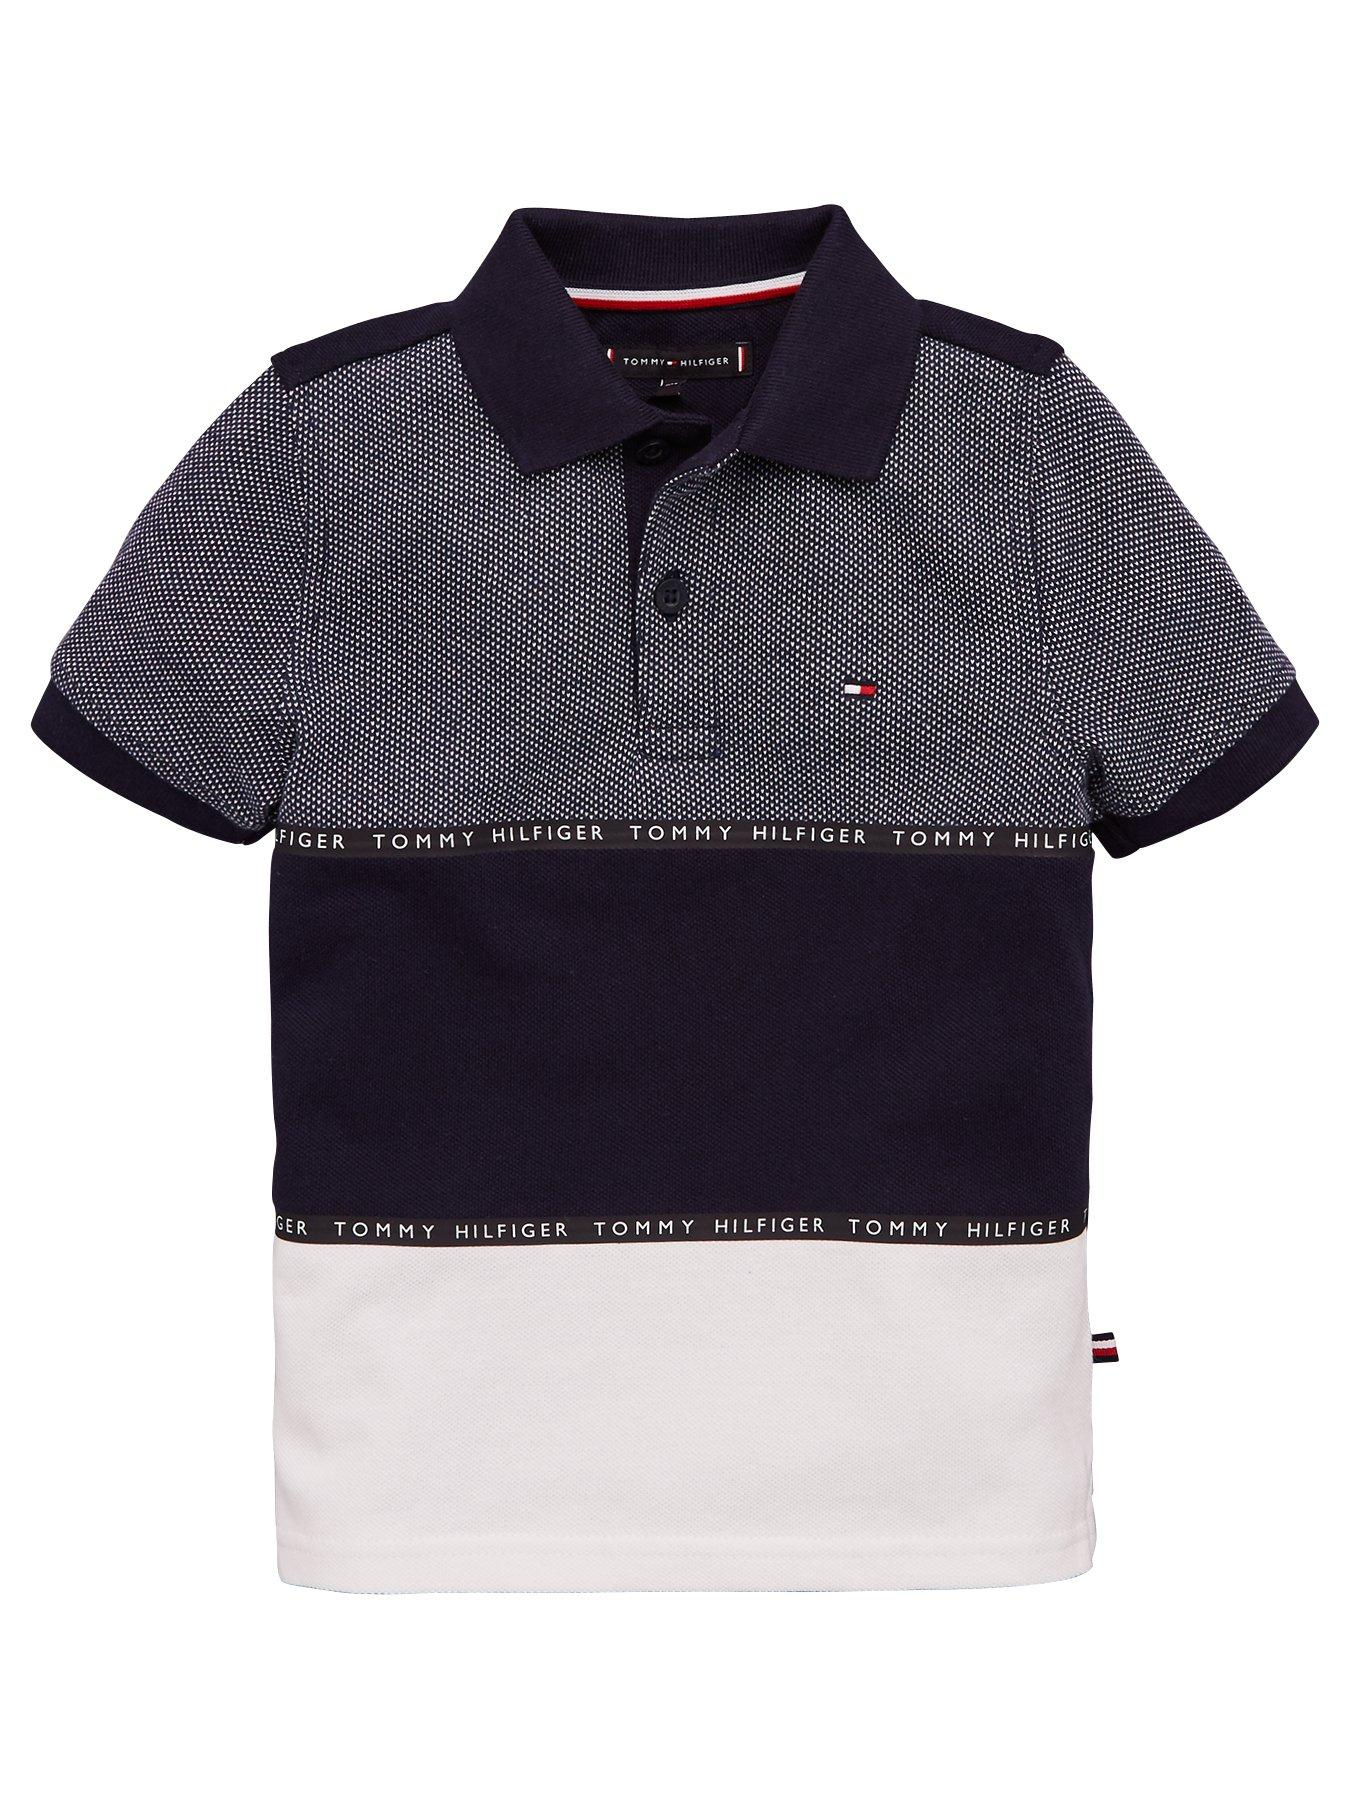 Tommy Hilfiger Polo Shirts: 221 Items | Stylight